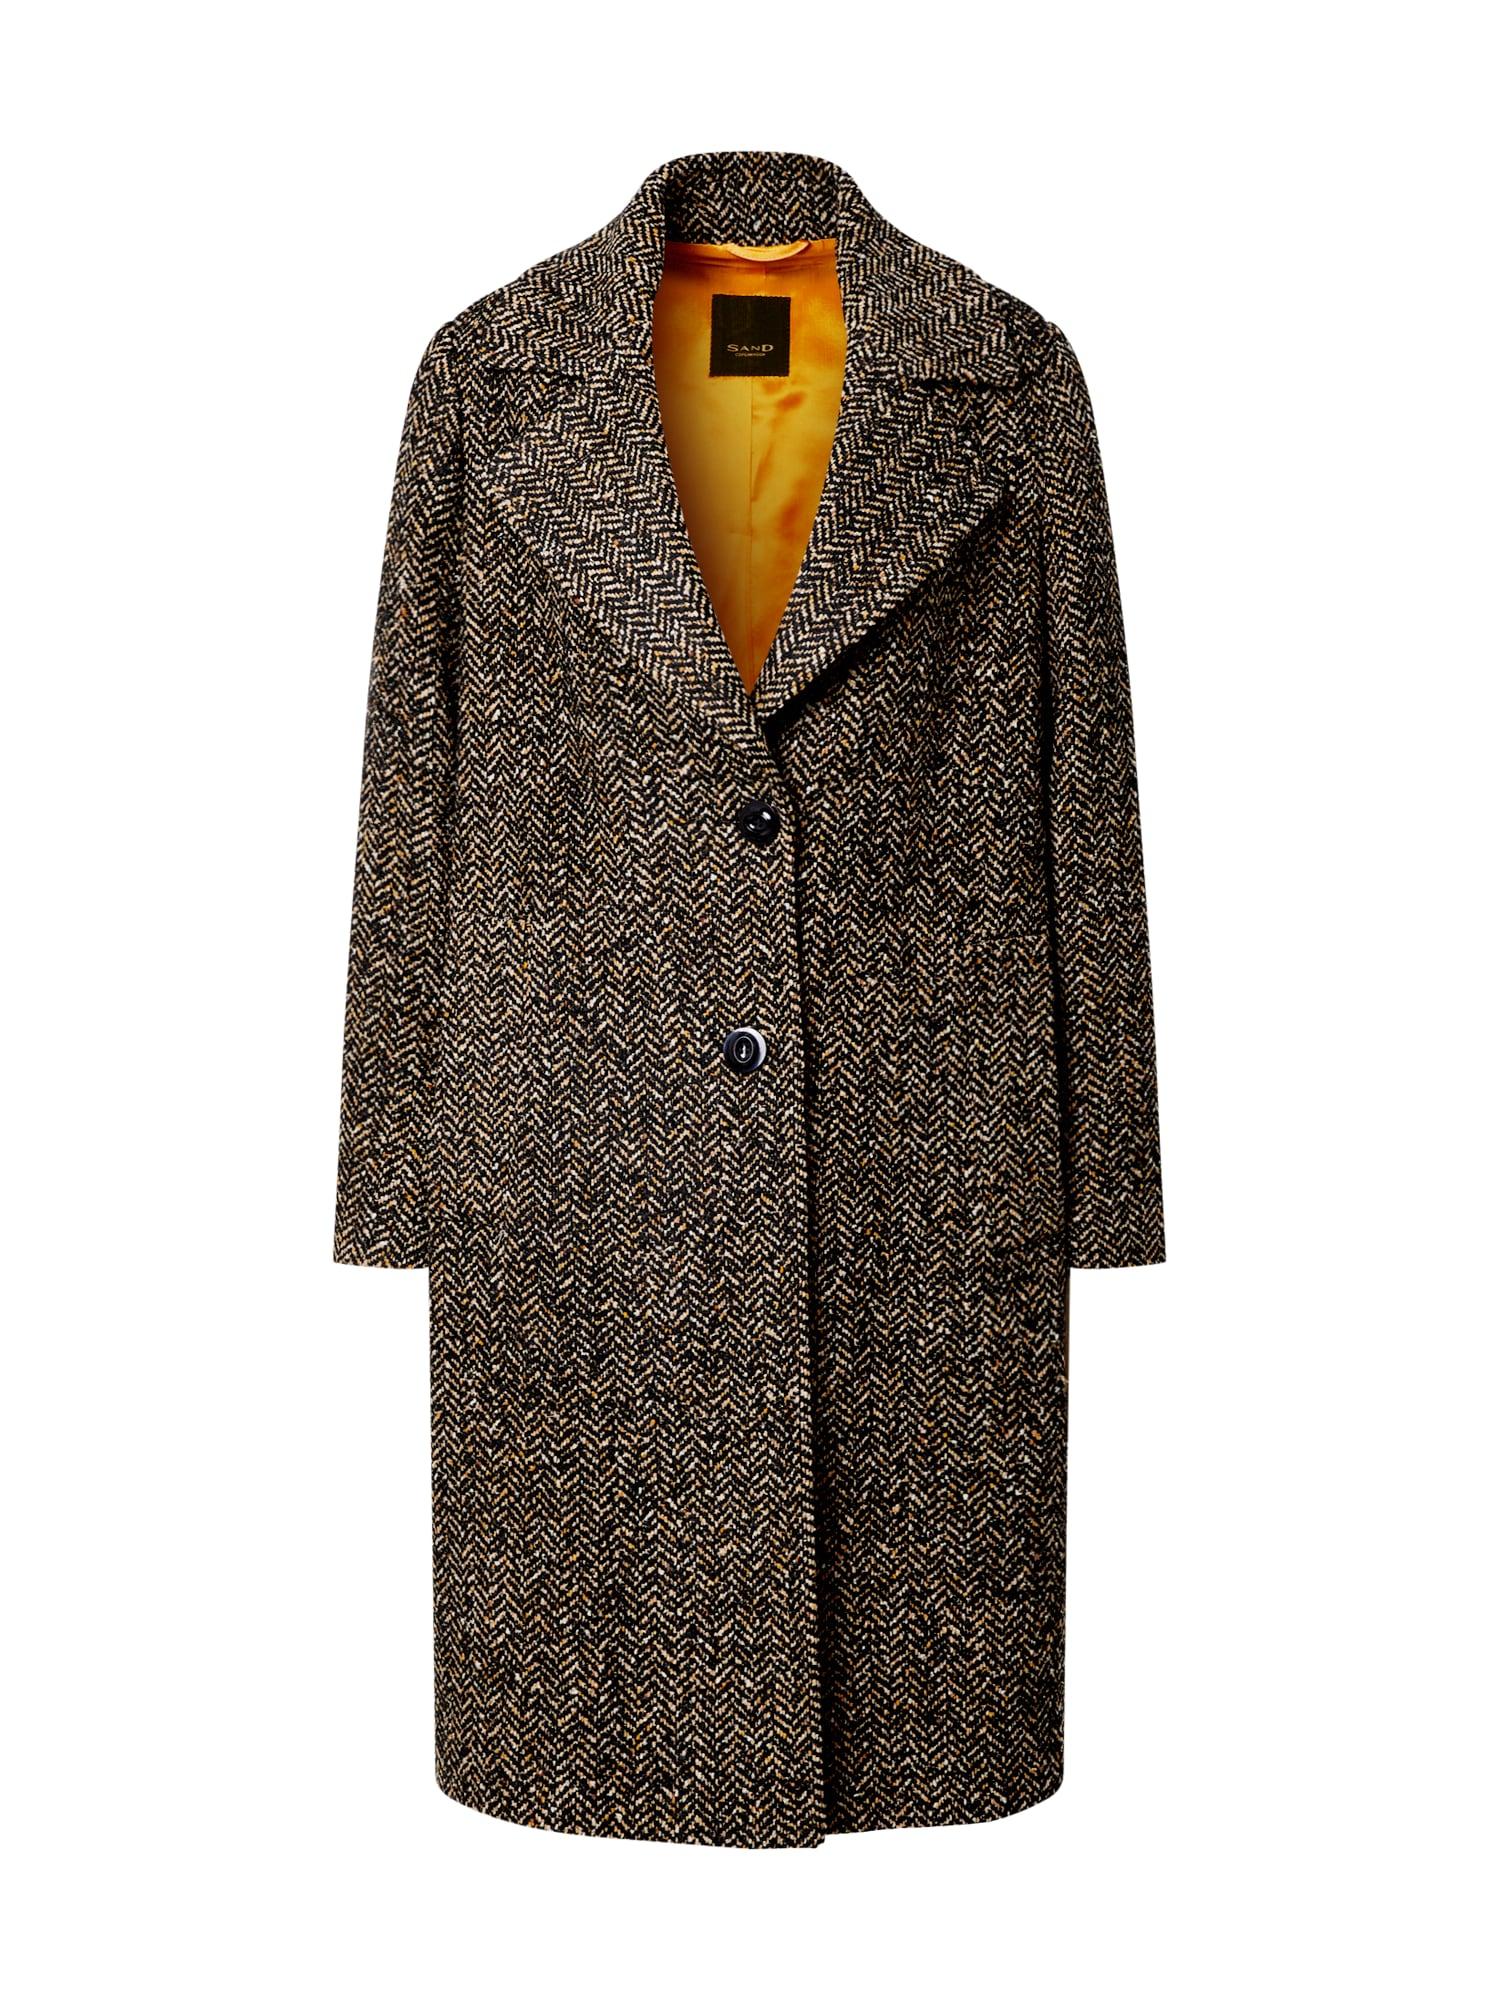 SAND COPENHAGEN Žieminis paltas